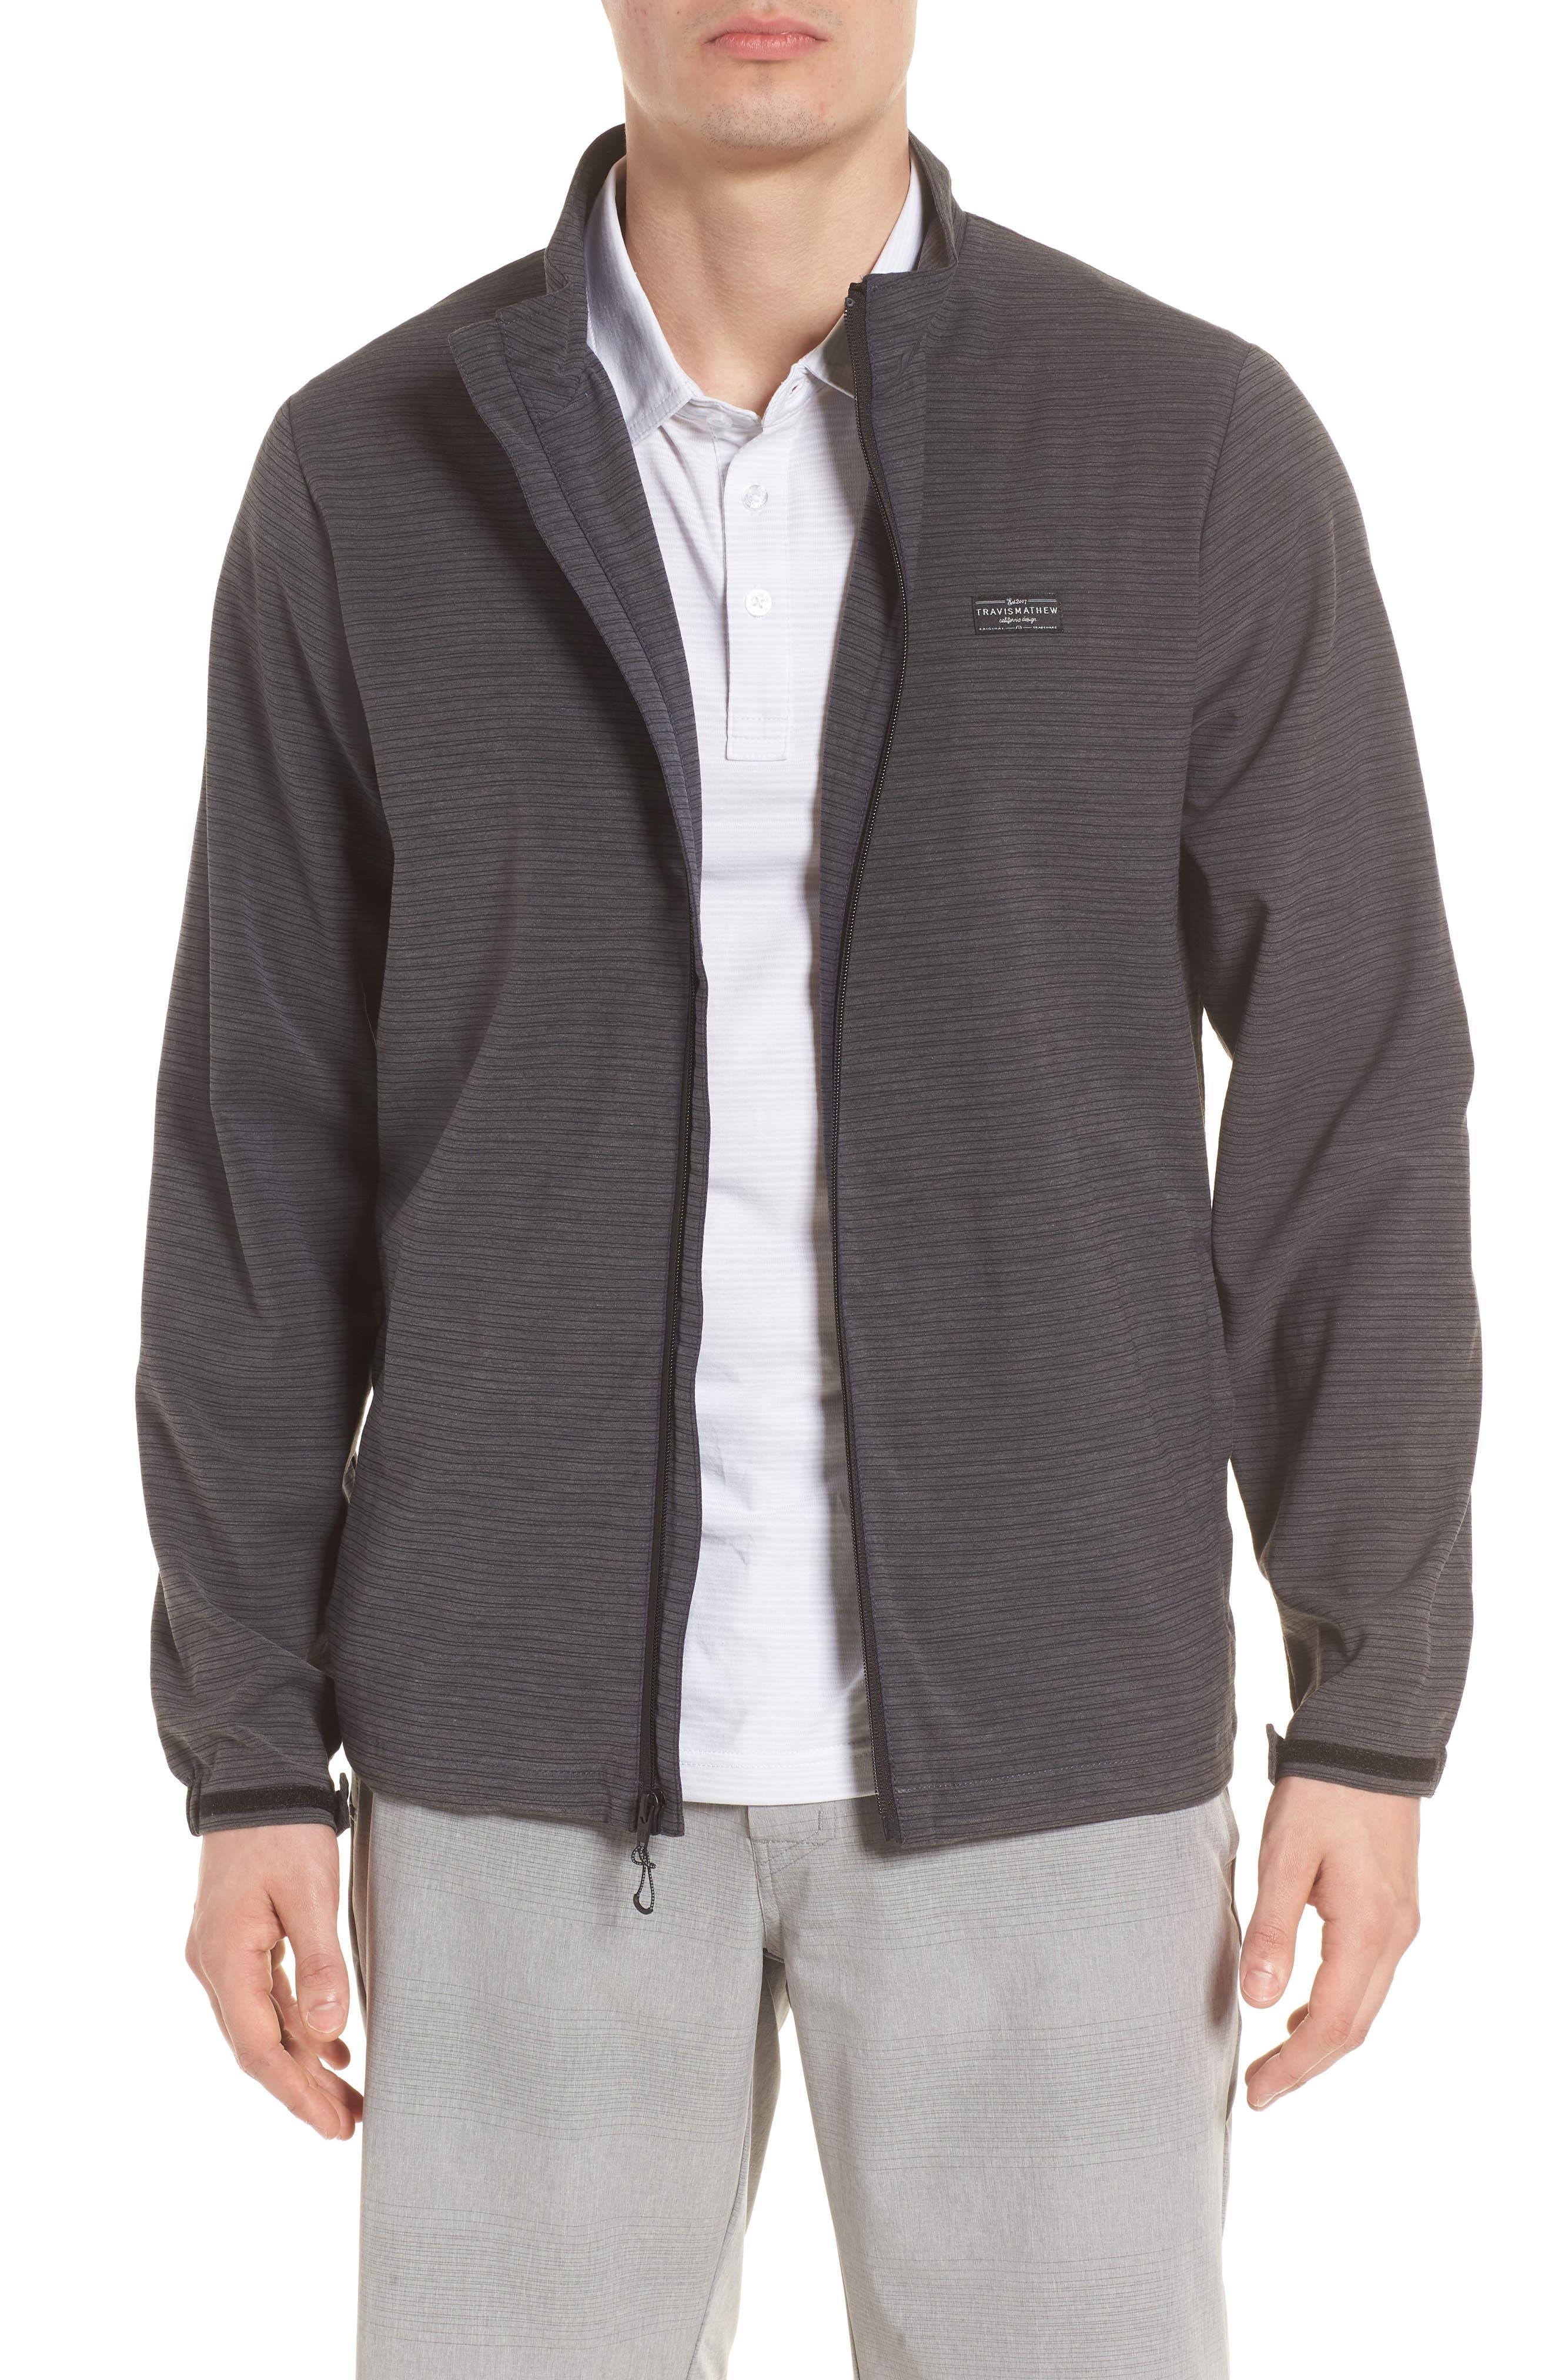 El Ganzo Zip Jacket,                             Main thumbnail 1, color,